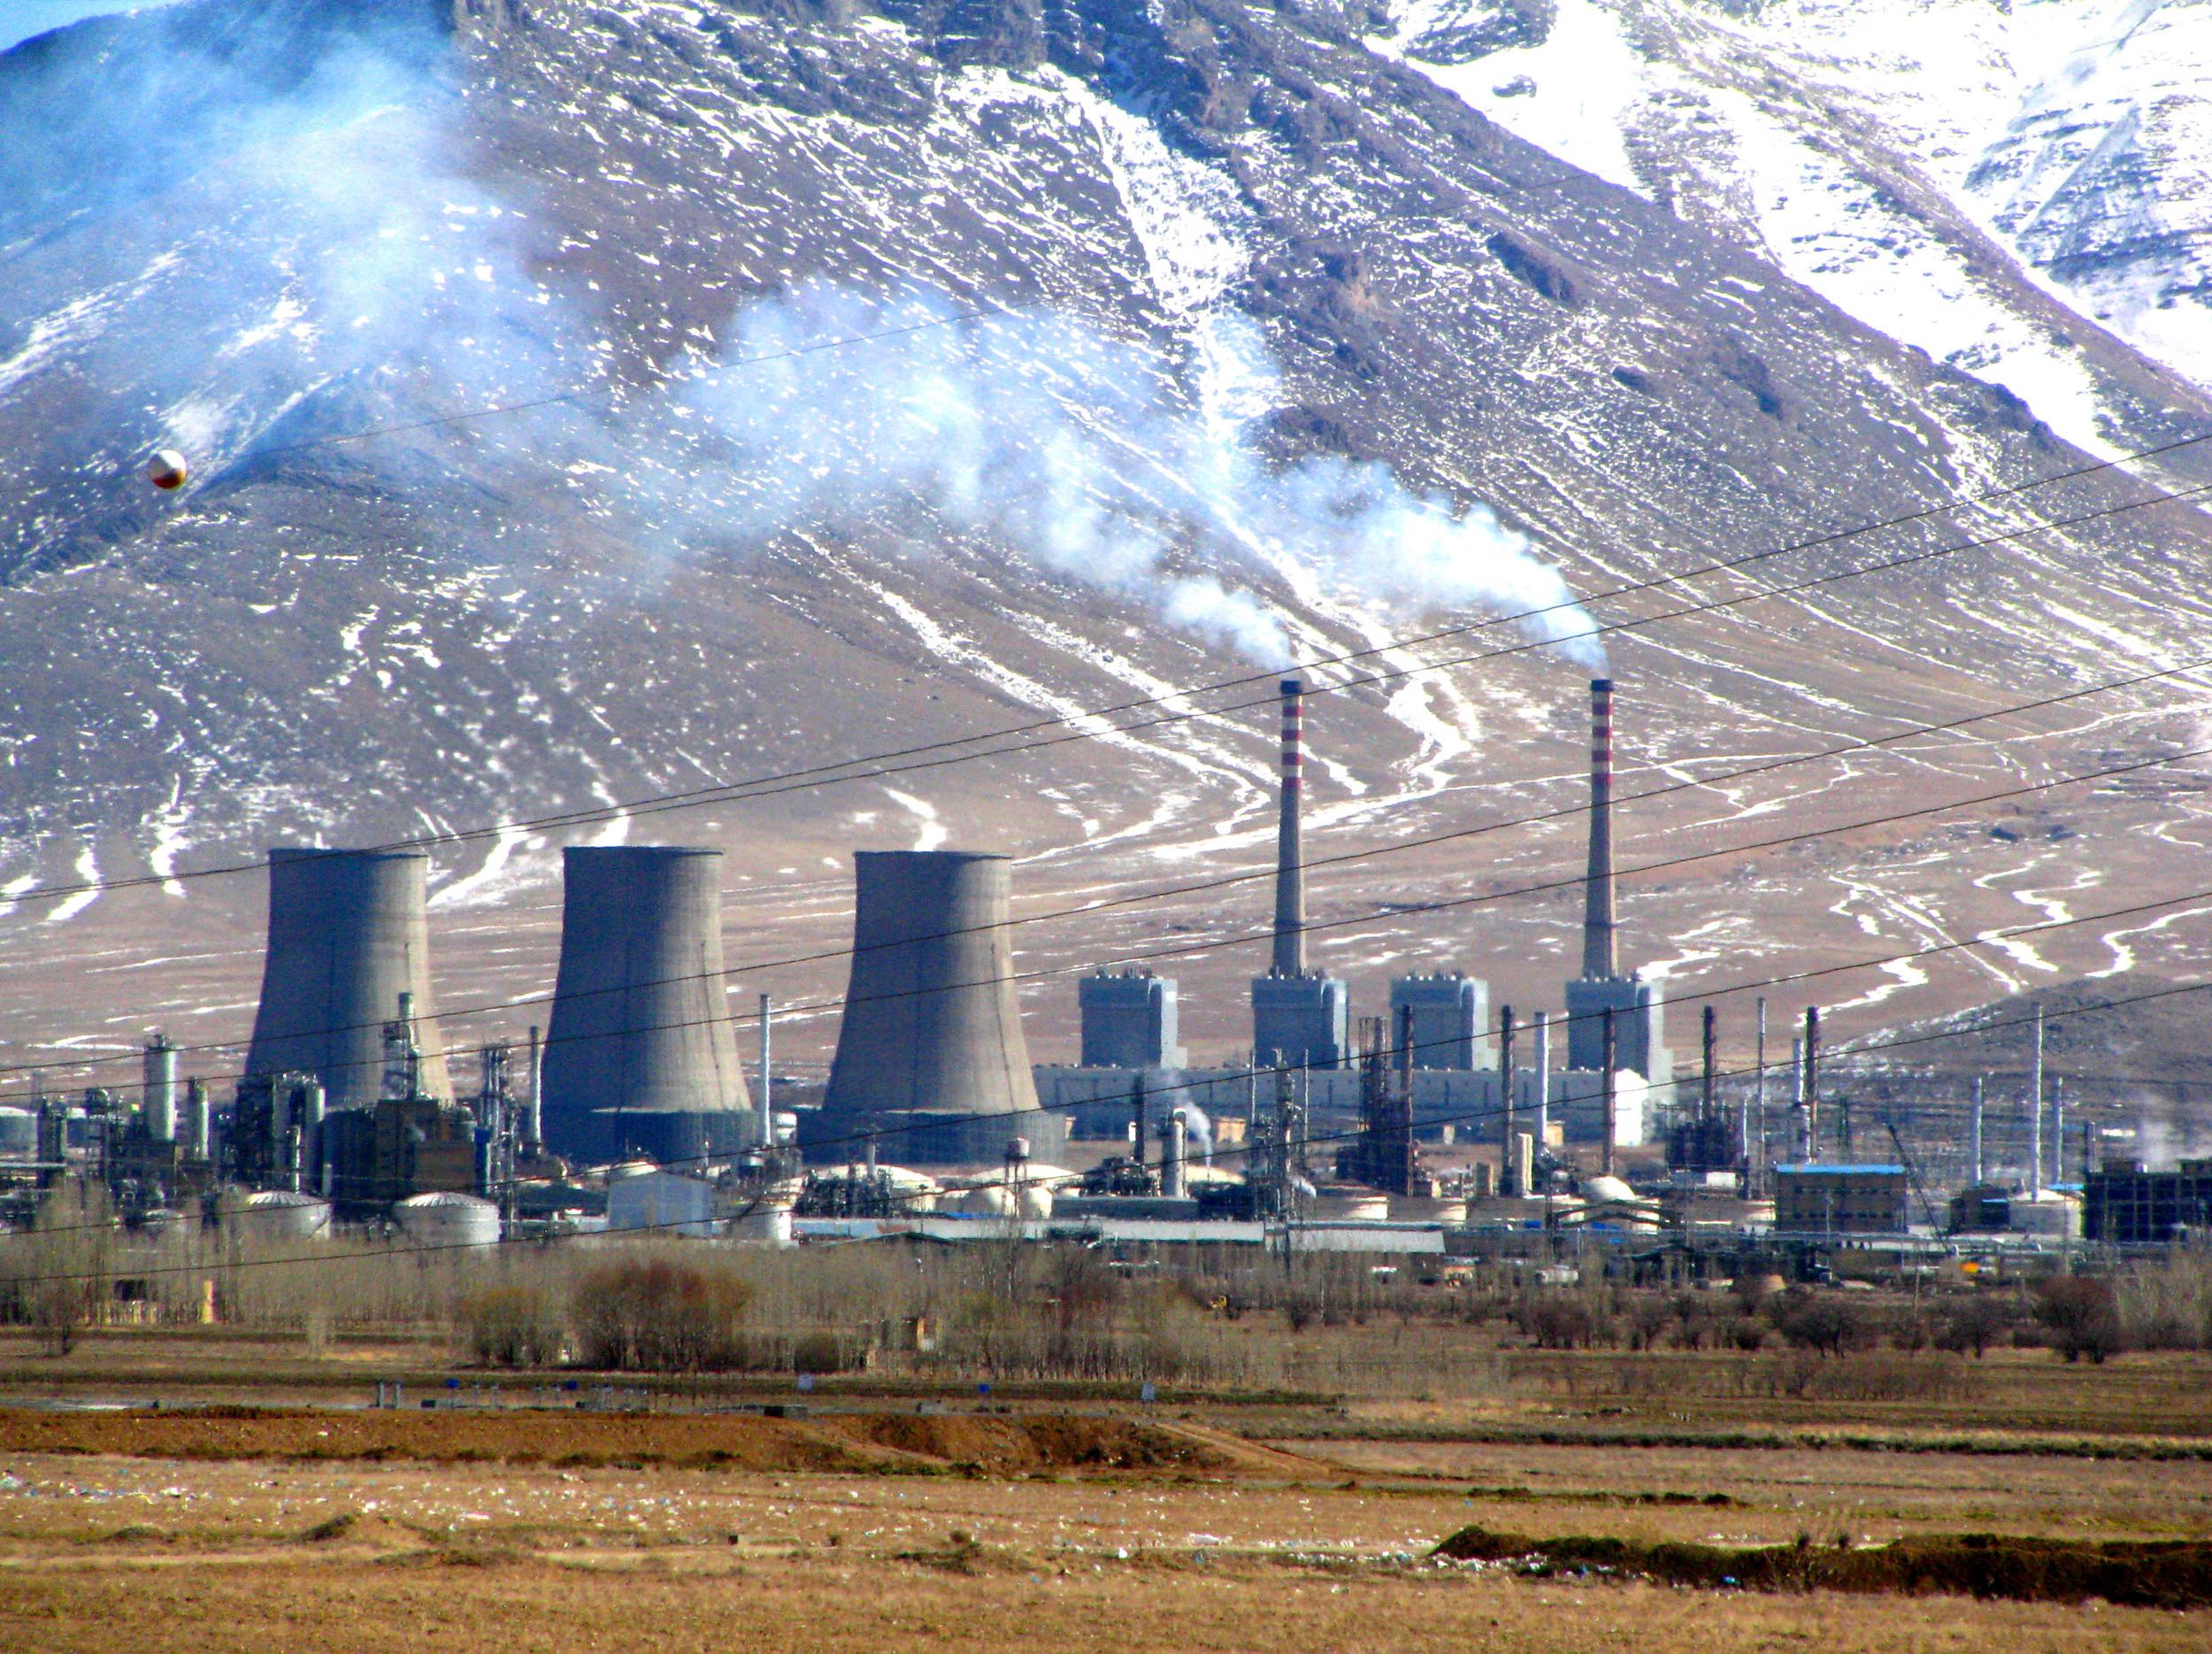 Image source: wikipedia/Energy_in_Iran